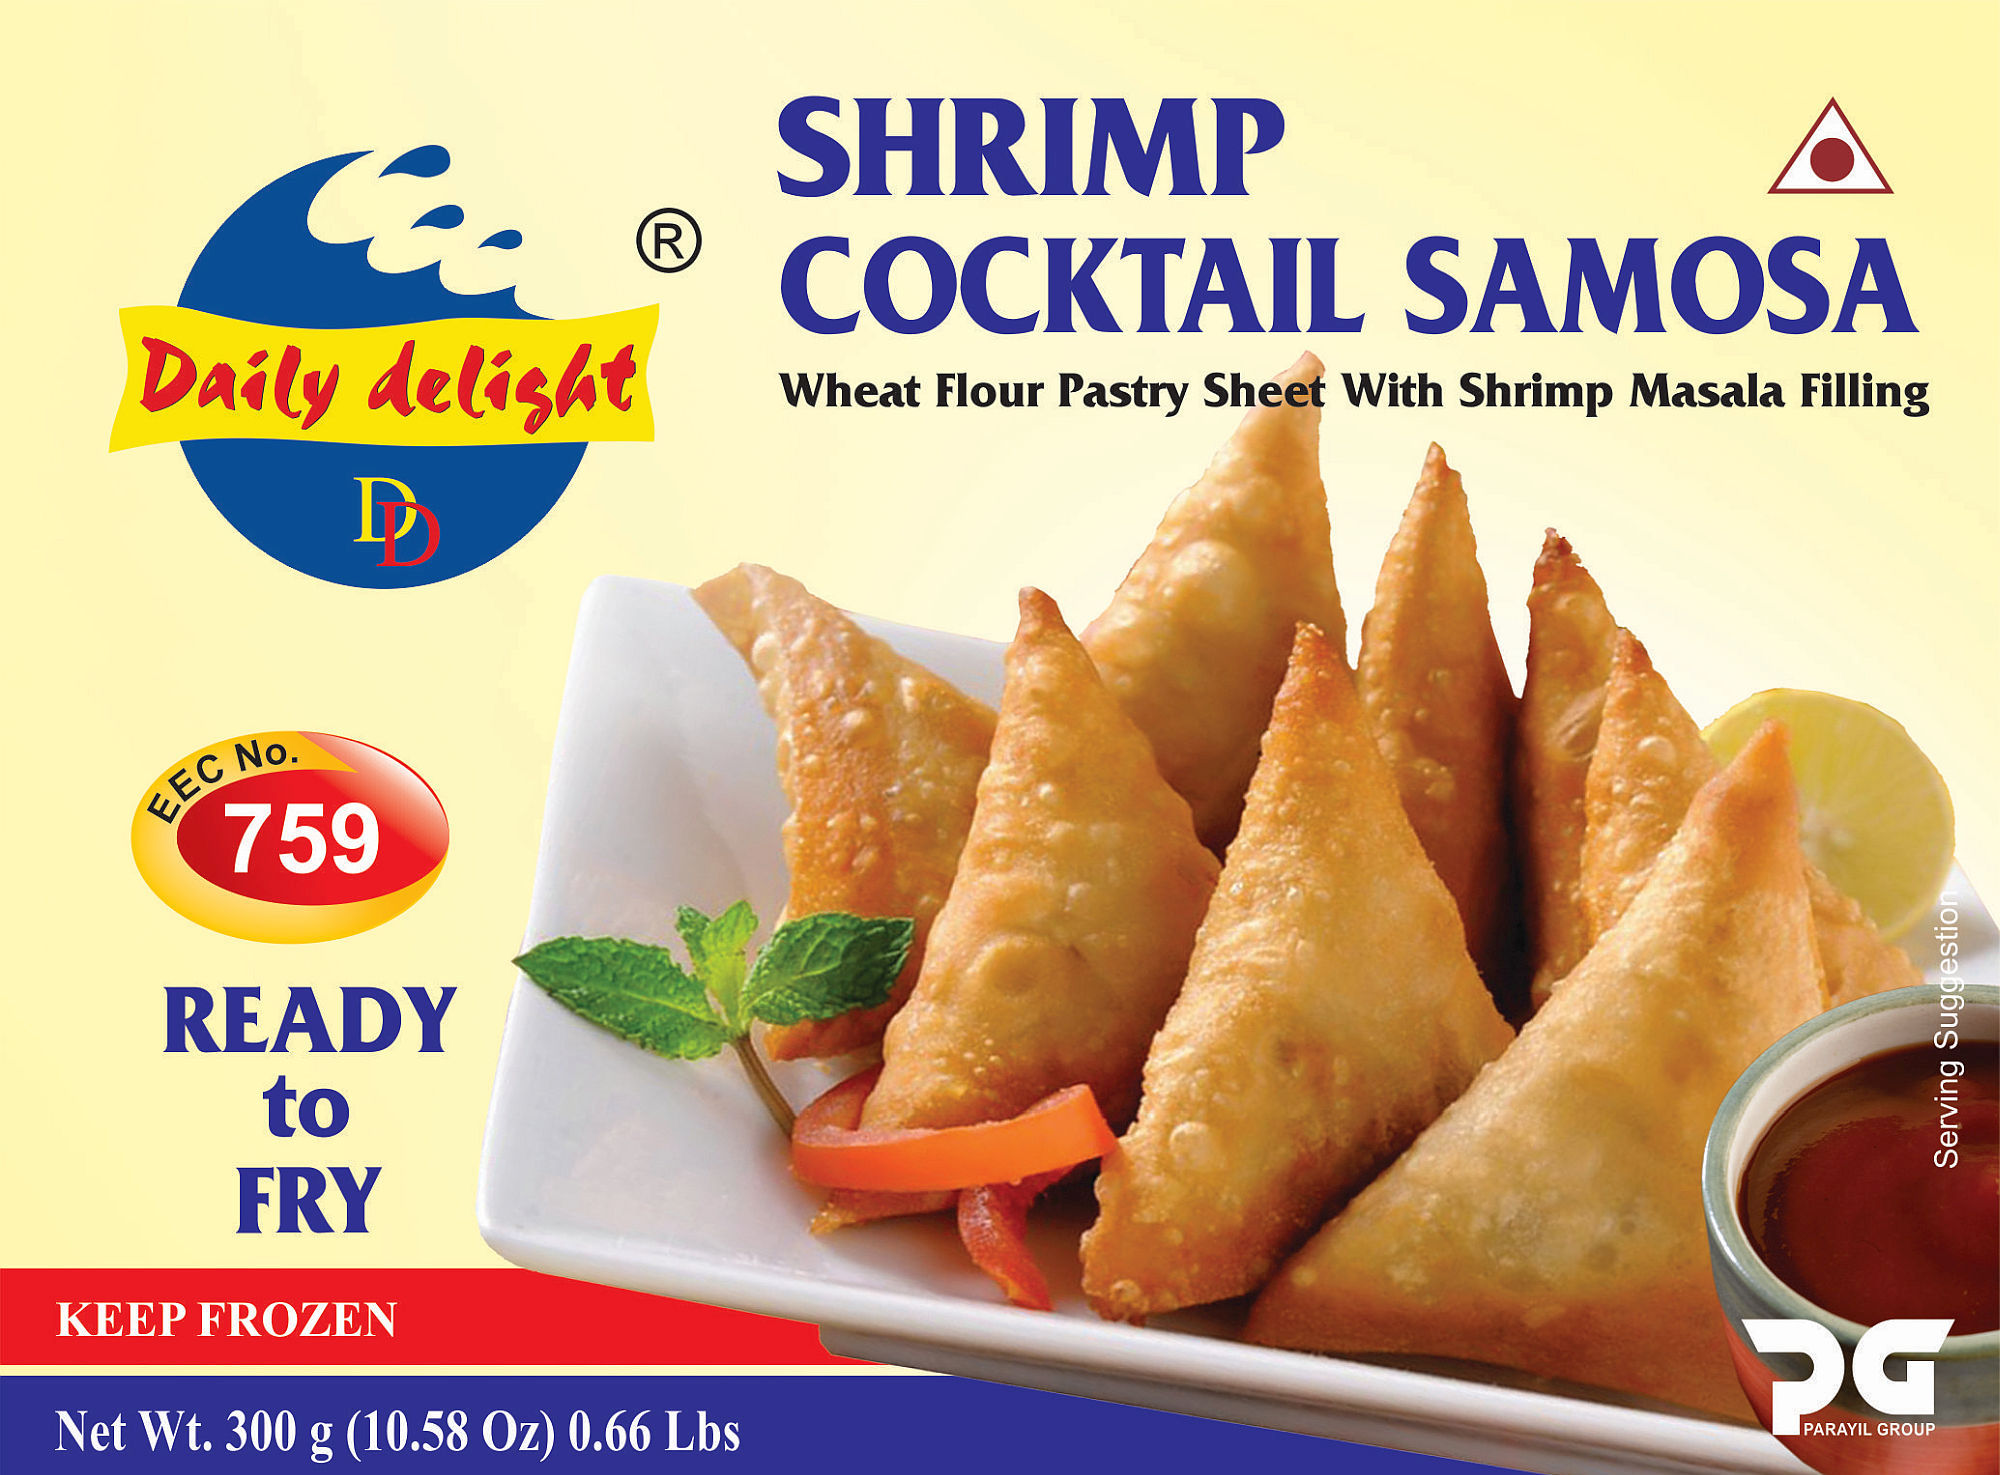 Daily Delight Shrimp Cocktail Samosa